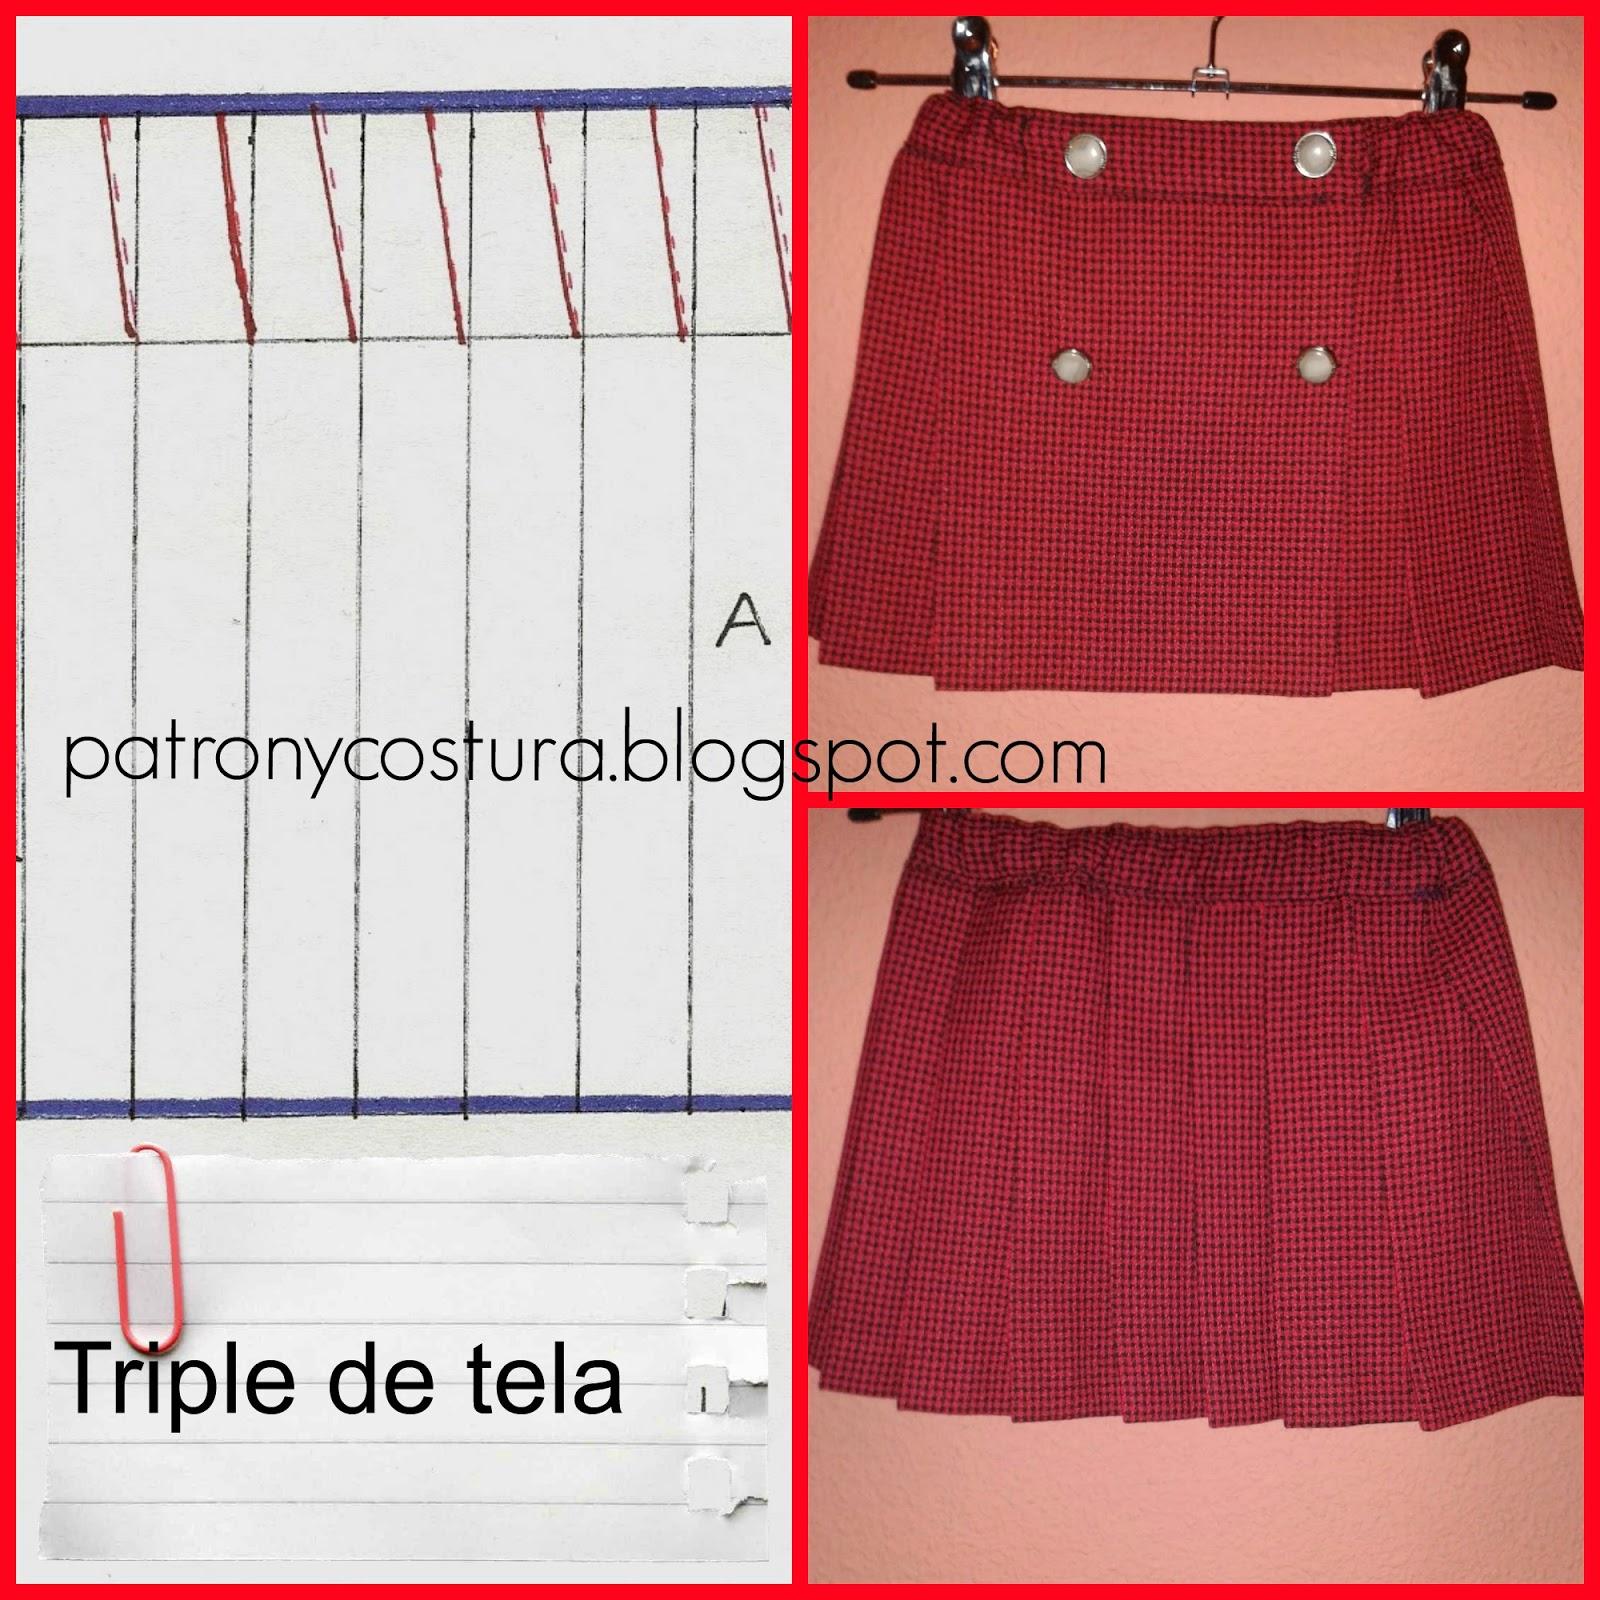 http://patronycostura.blogspot.com/2013/12/tema-23-falda-plisada.html